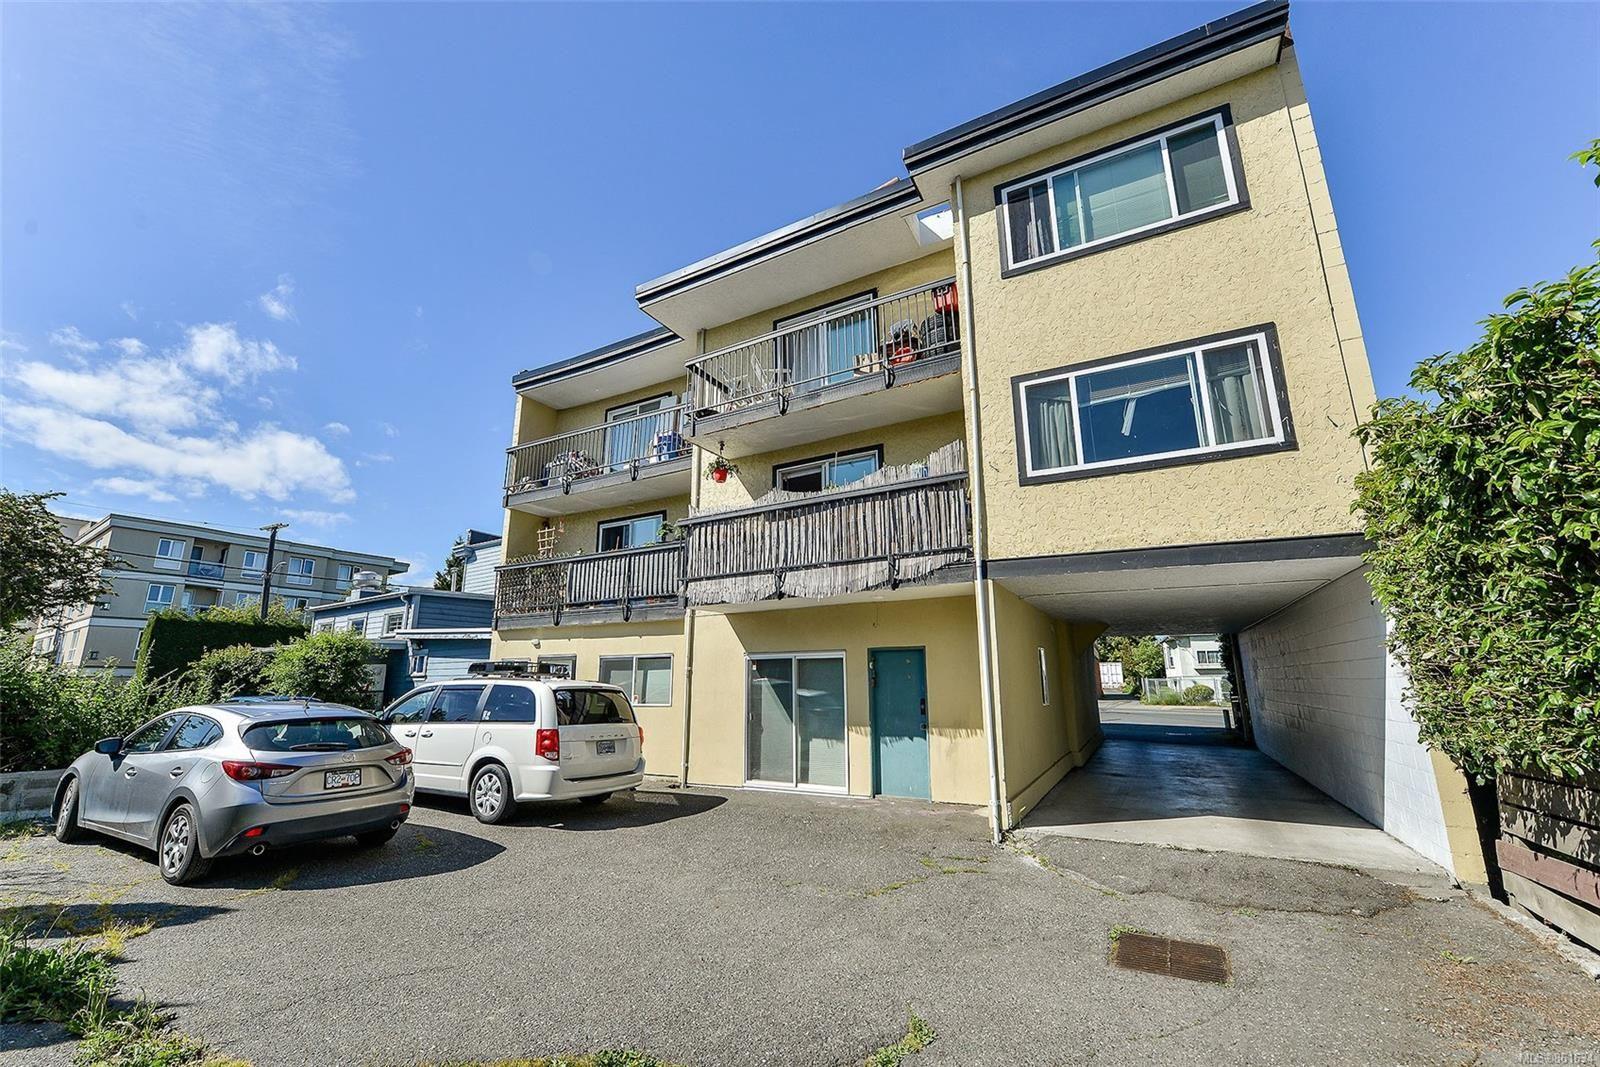 Photo 15: Photos: 367 E Burnside Rd in : Vi Burnside Quadruplex for sale (Victoria)  : MLS®# 861634